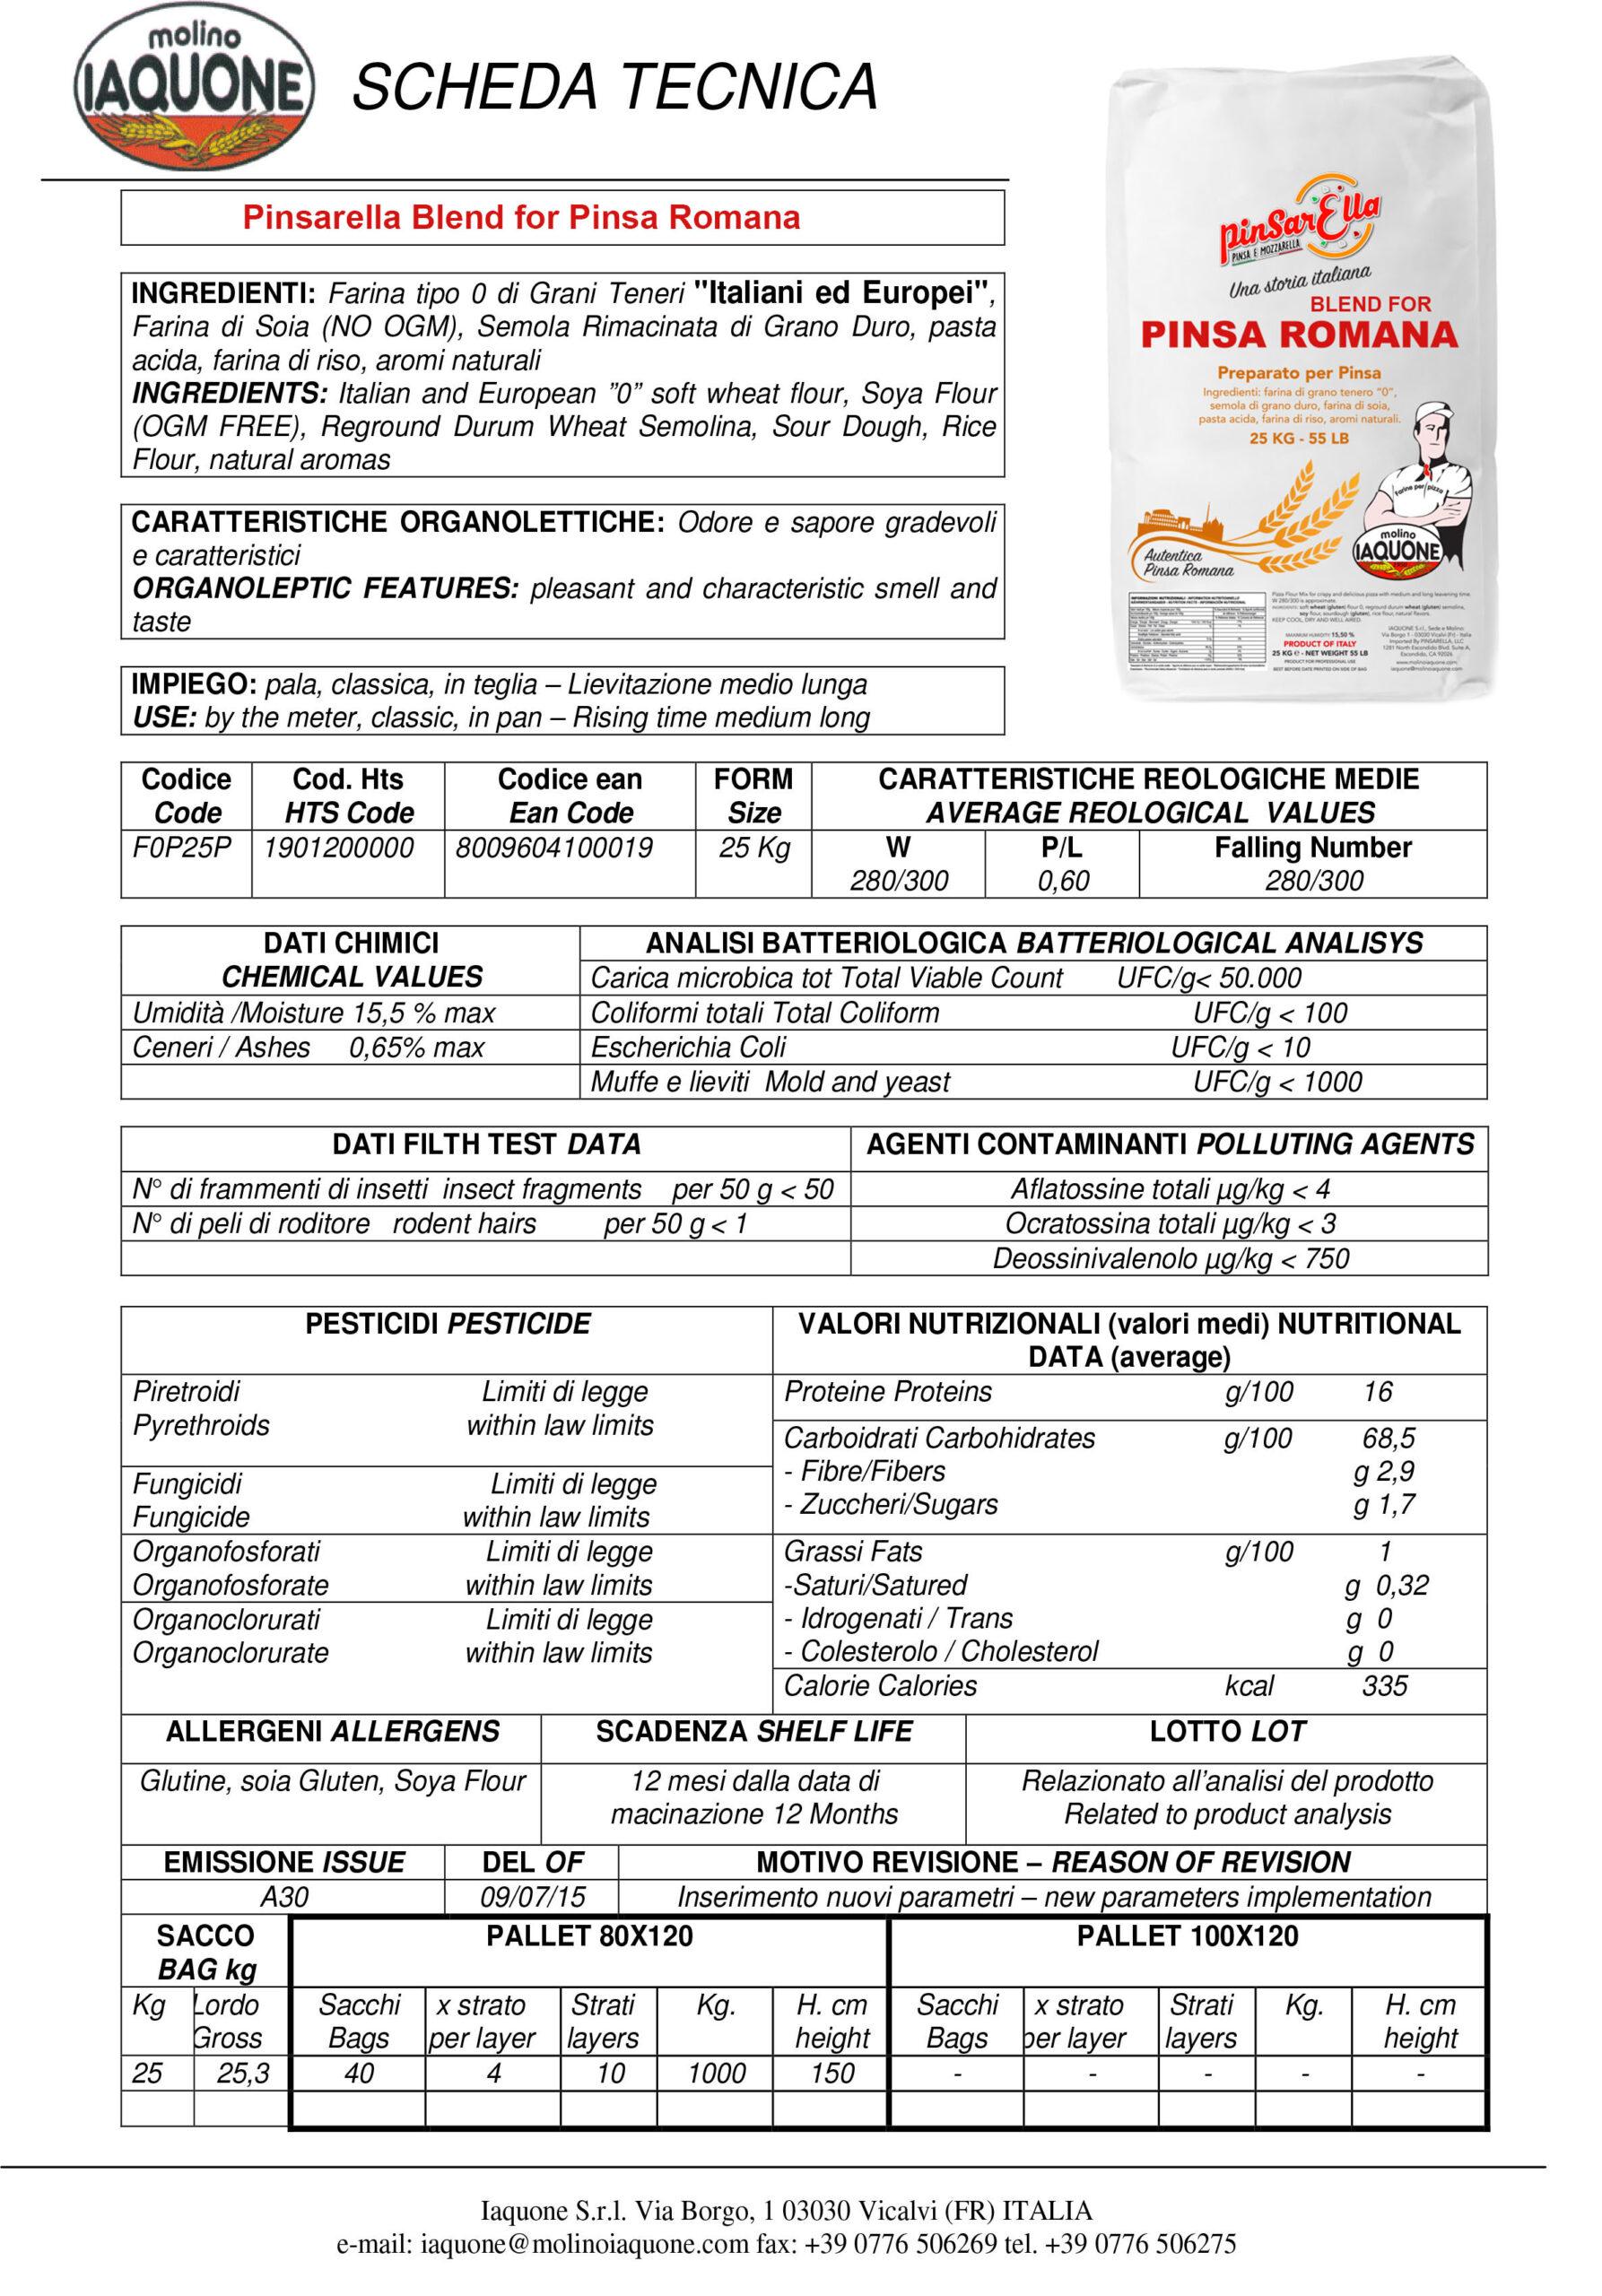 Pinsarella flour mix ingredients